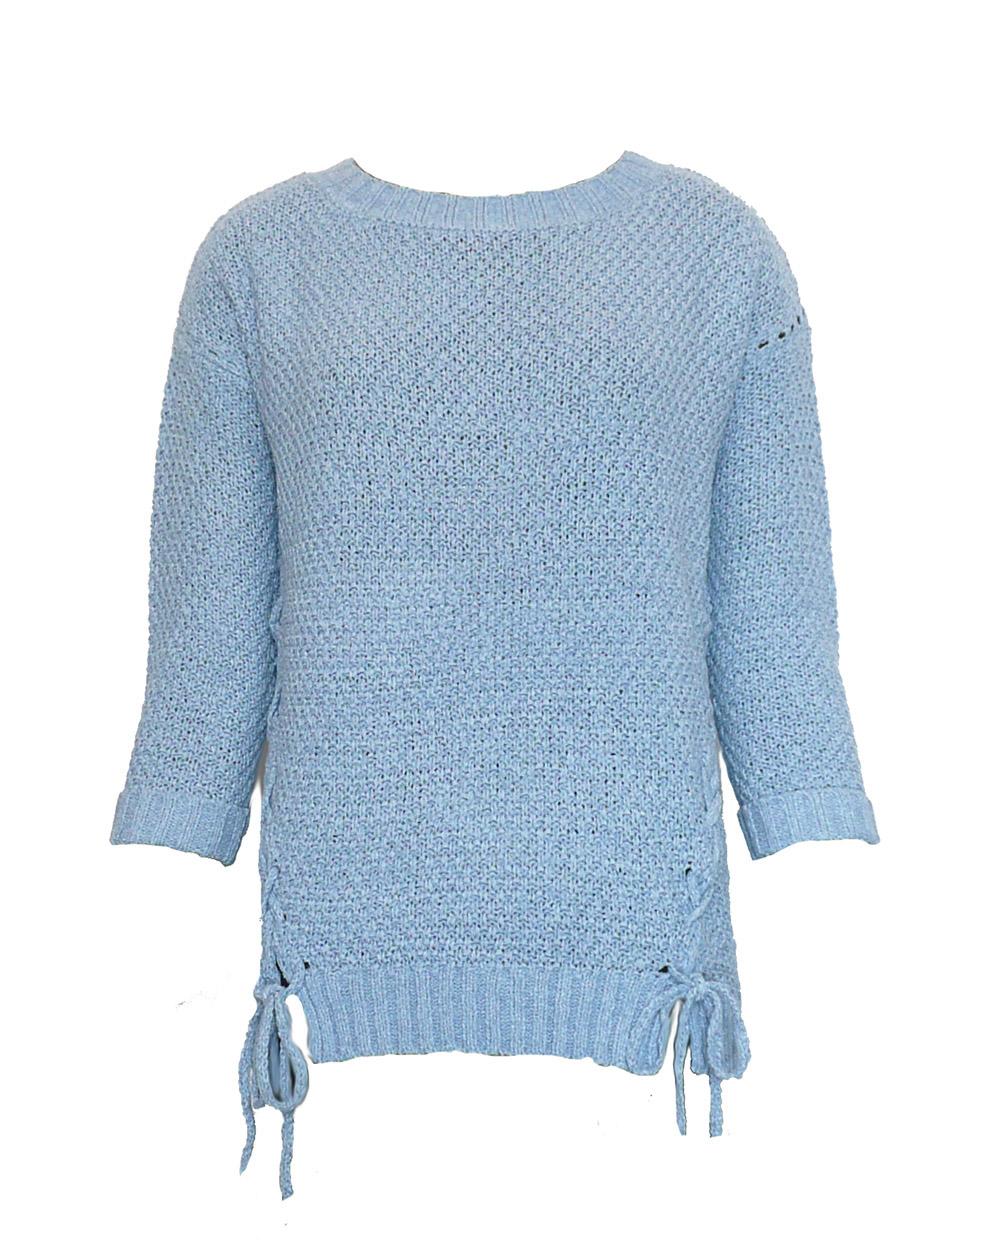 knit blu cyrus.jpg